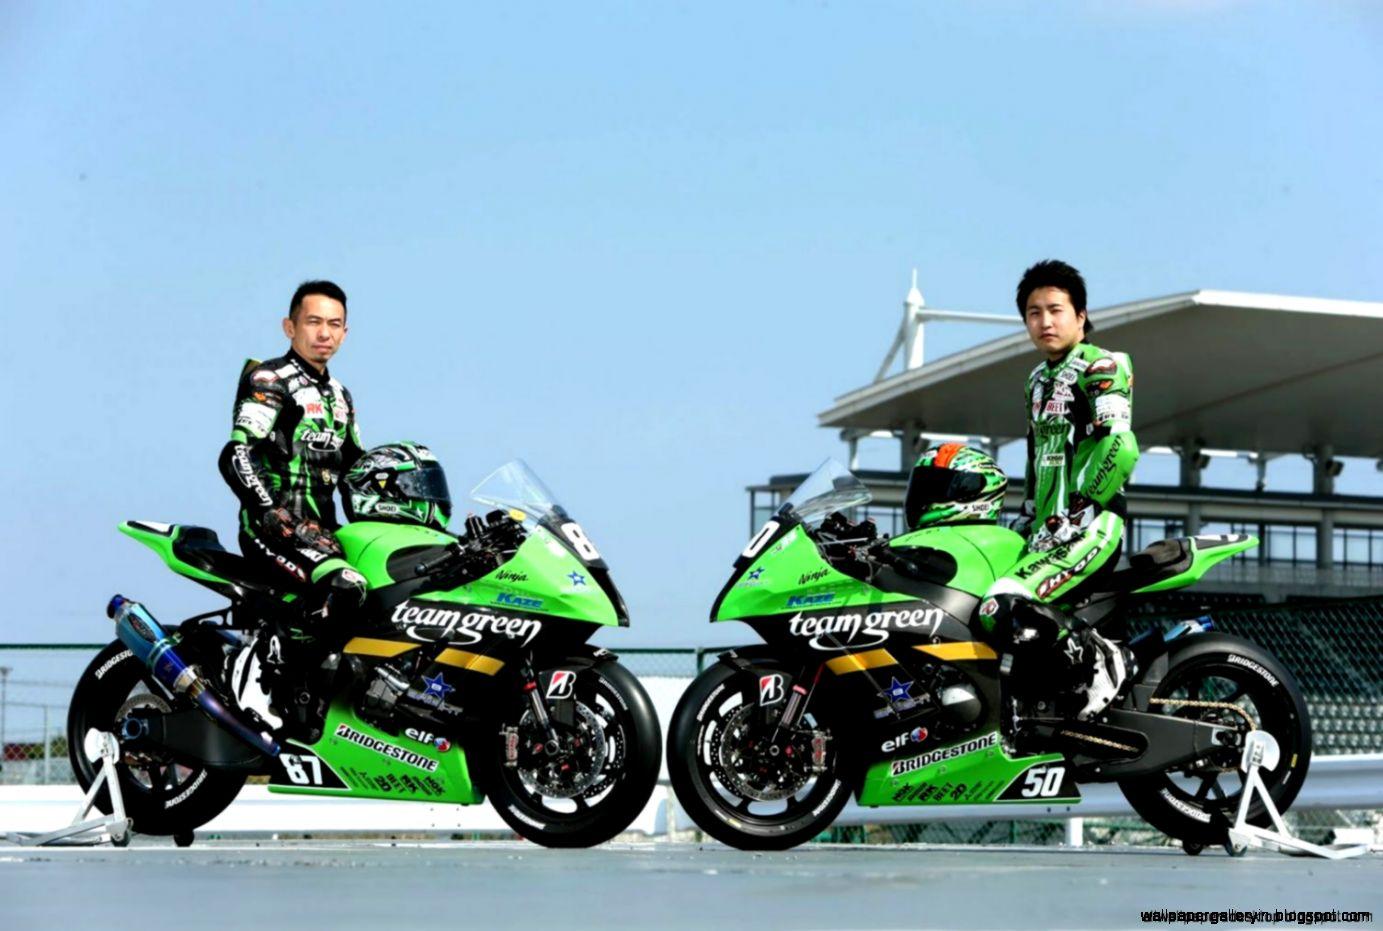 Ninja Yanagawa Kawasaki Hd  All Wallpapers Desktop